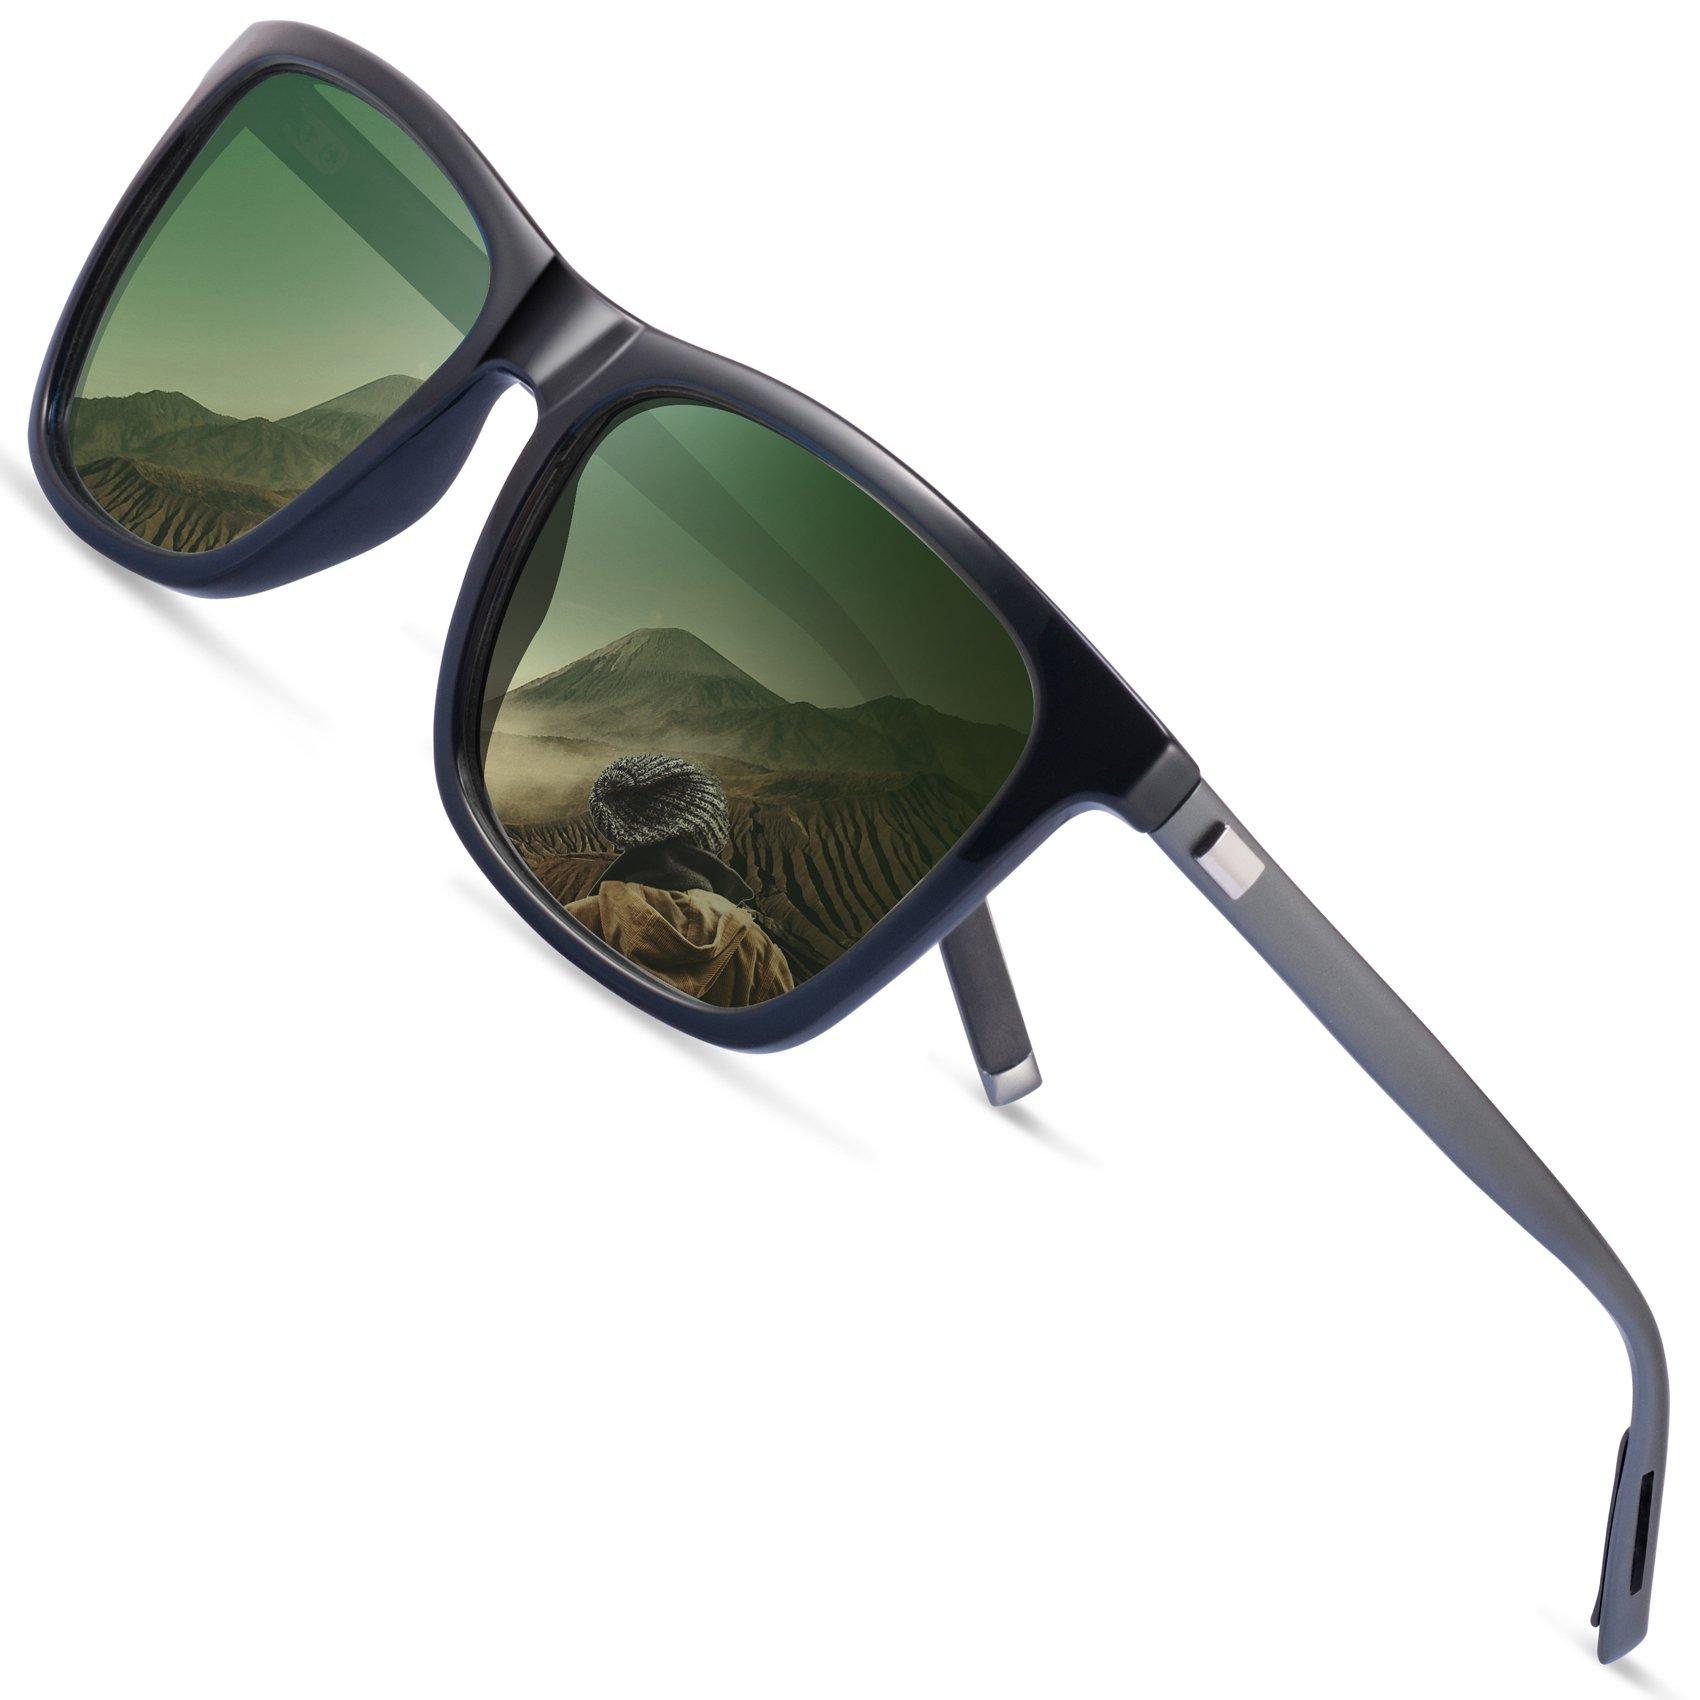 Polarized Wayfarer Sunglasses for Men - FEIDU HD Vision Polarized Sunglasses Mens FD9003 (green-9003, 2.08)